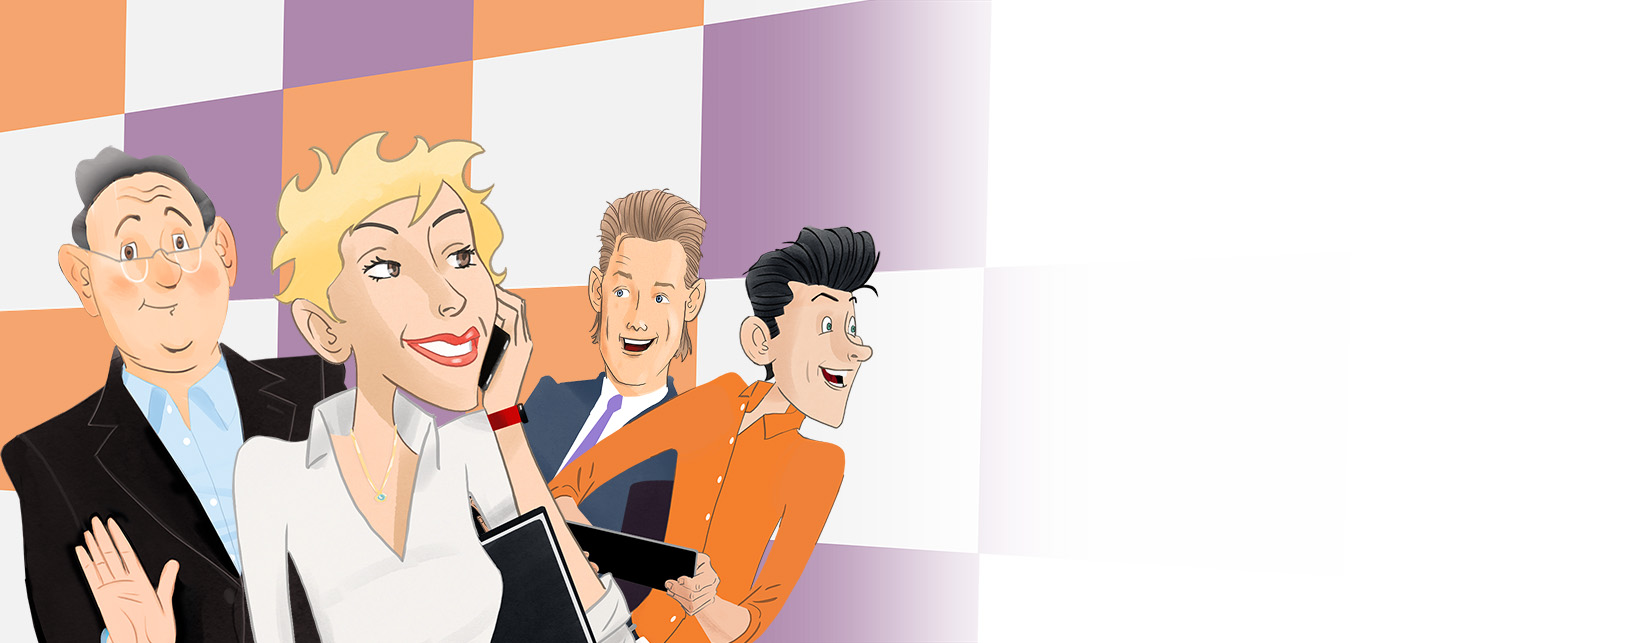 BWV Bildungsverband Discover Digital